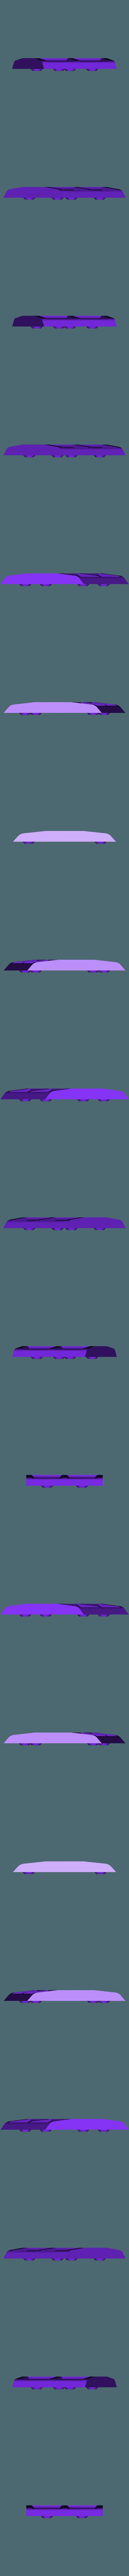 Desert_Fox_Skid_20190225.stl Download free STL file Hobbyking Desert Fox Front and/or Back Skid • 3D printing object, peterbroeders